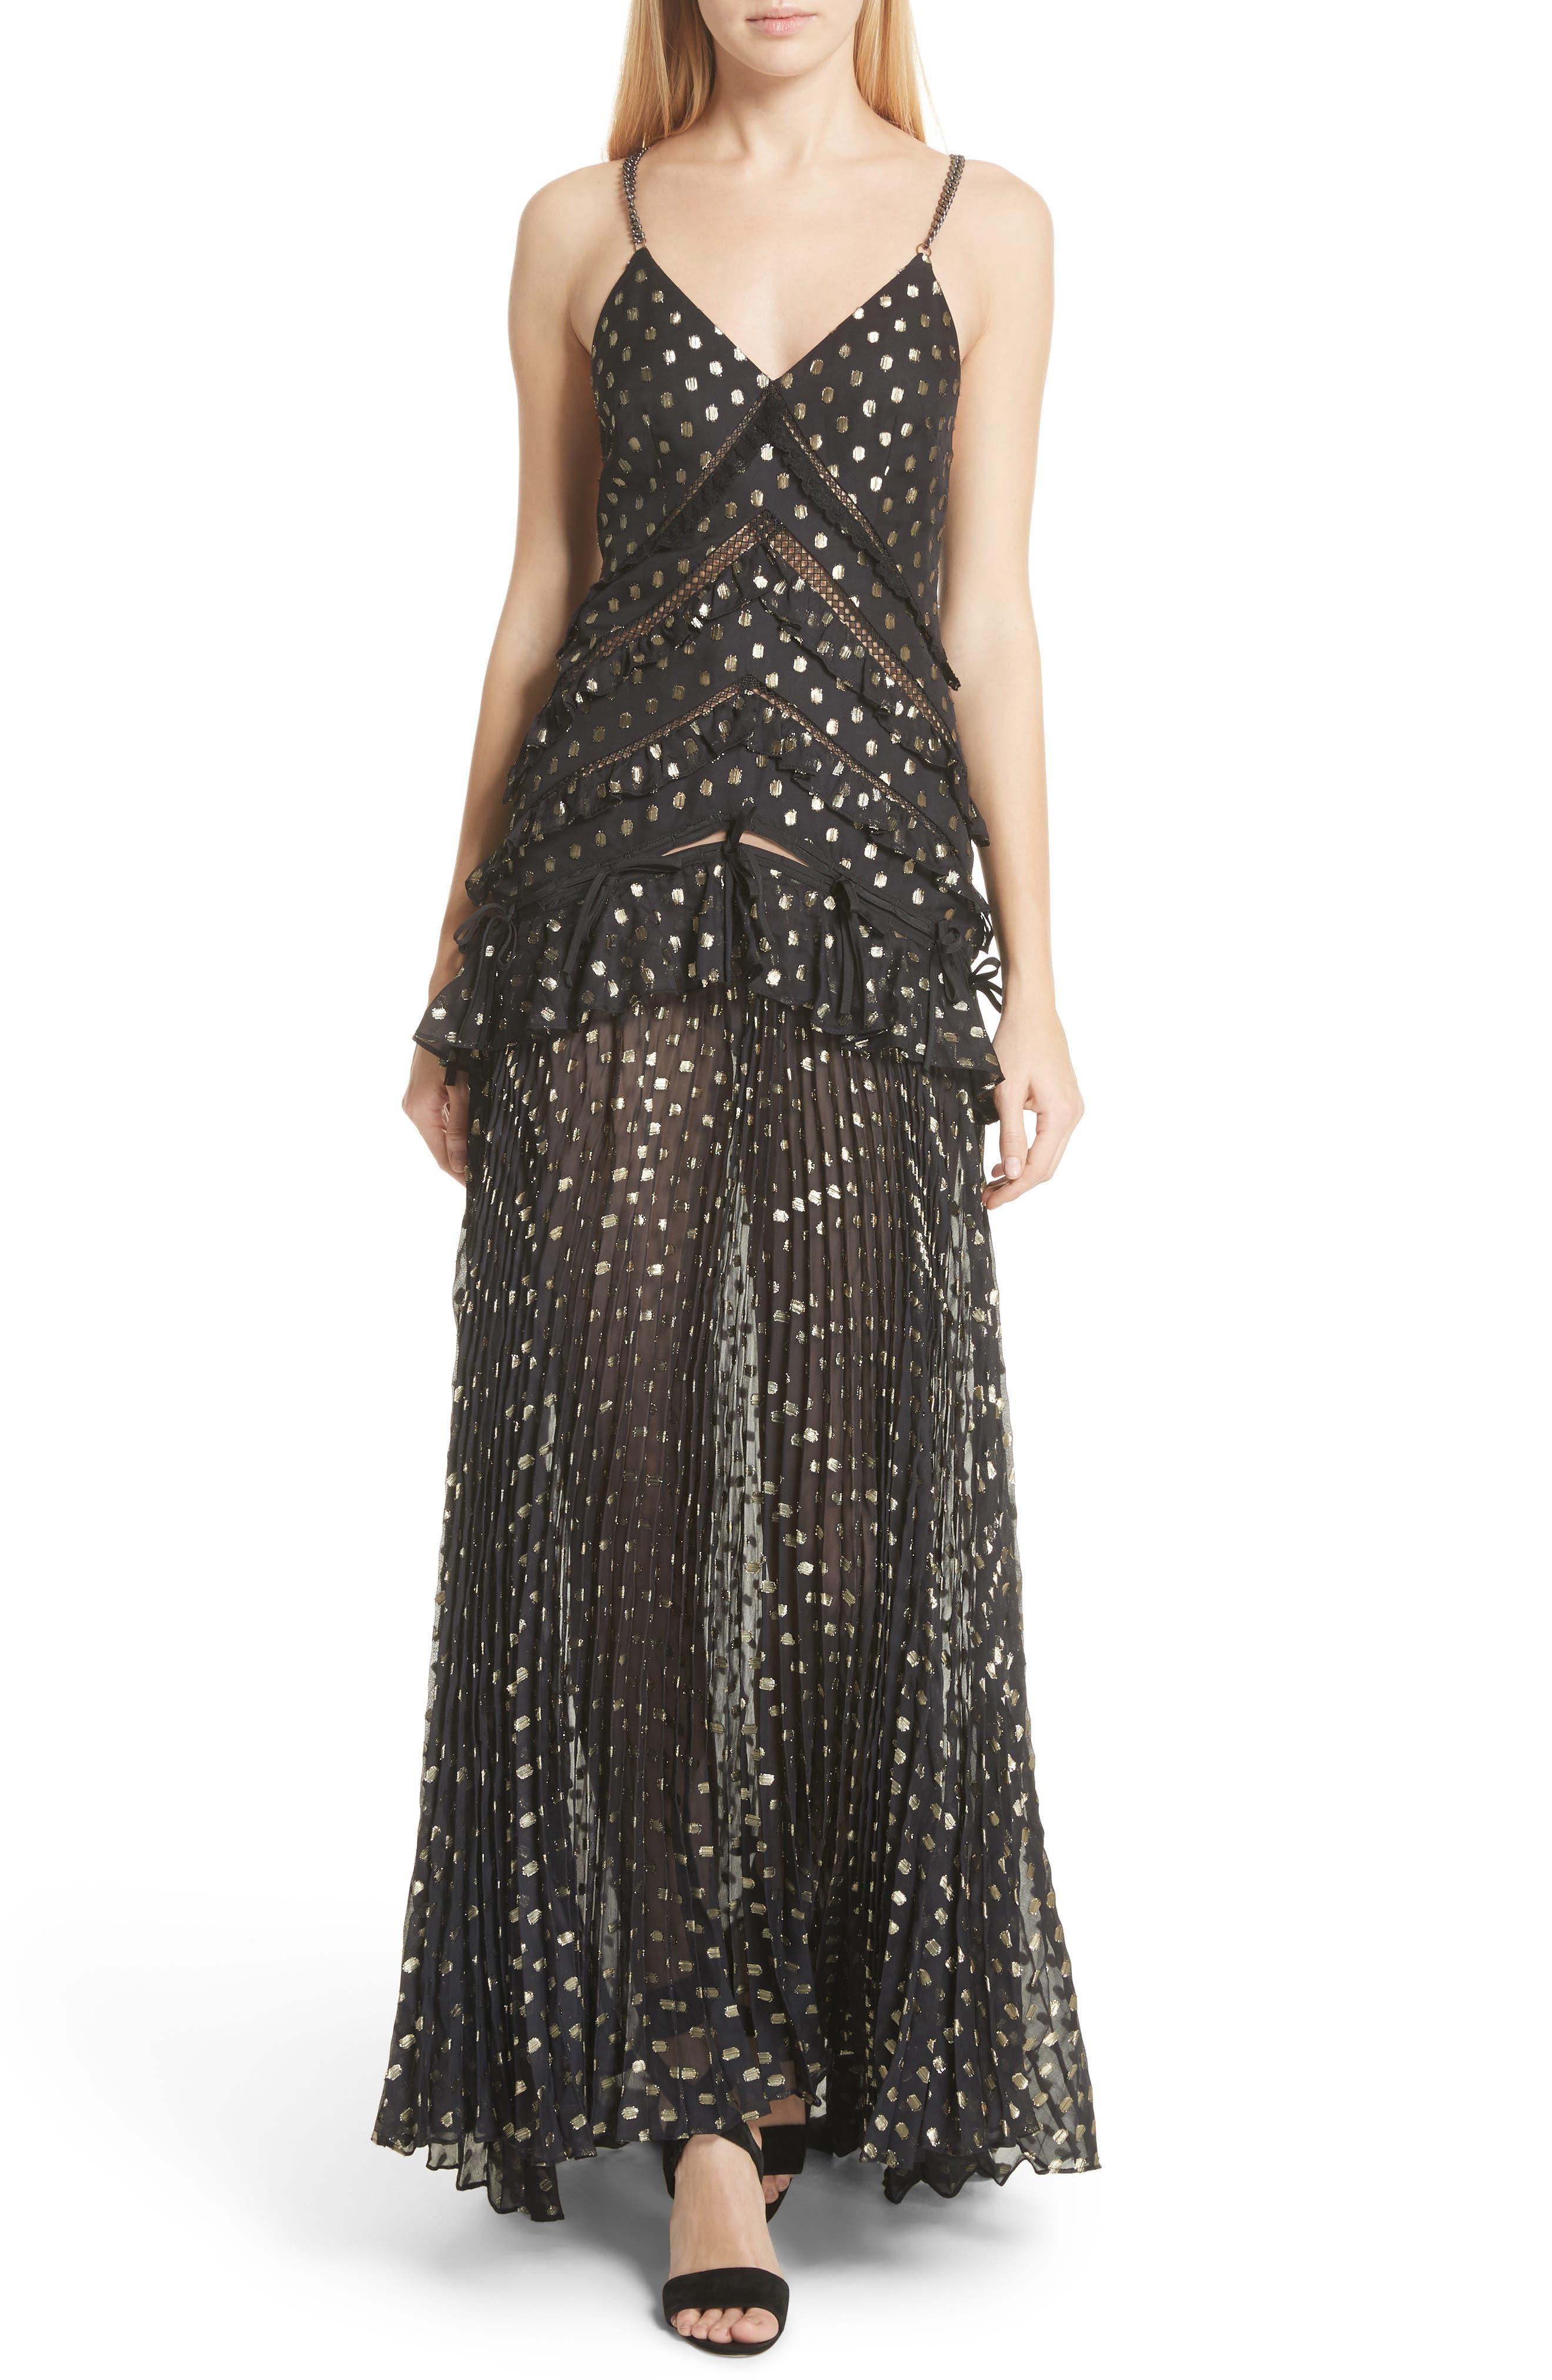 Self-Portrait Metallic Polka Dot Chain Strap Dress